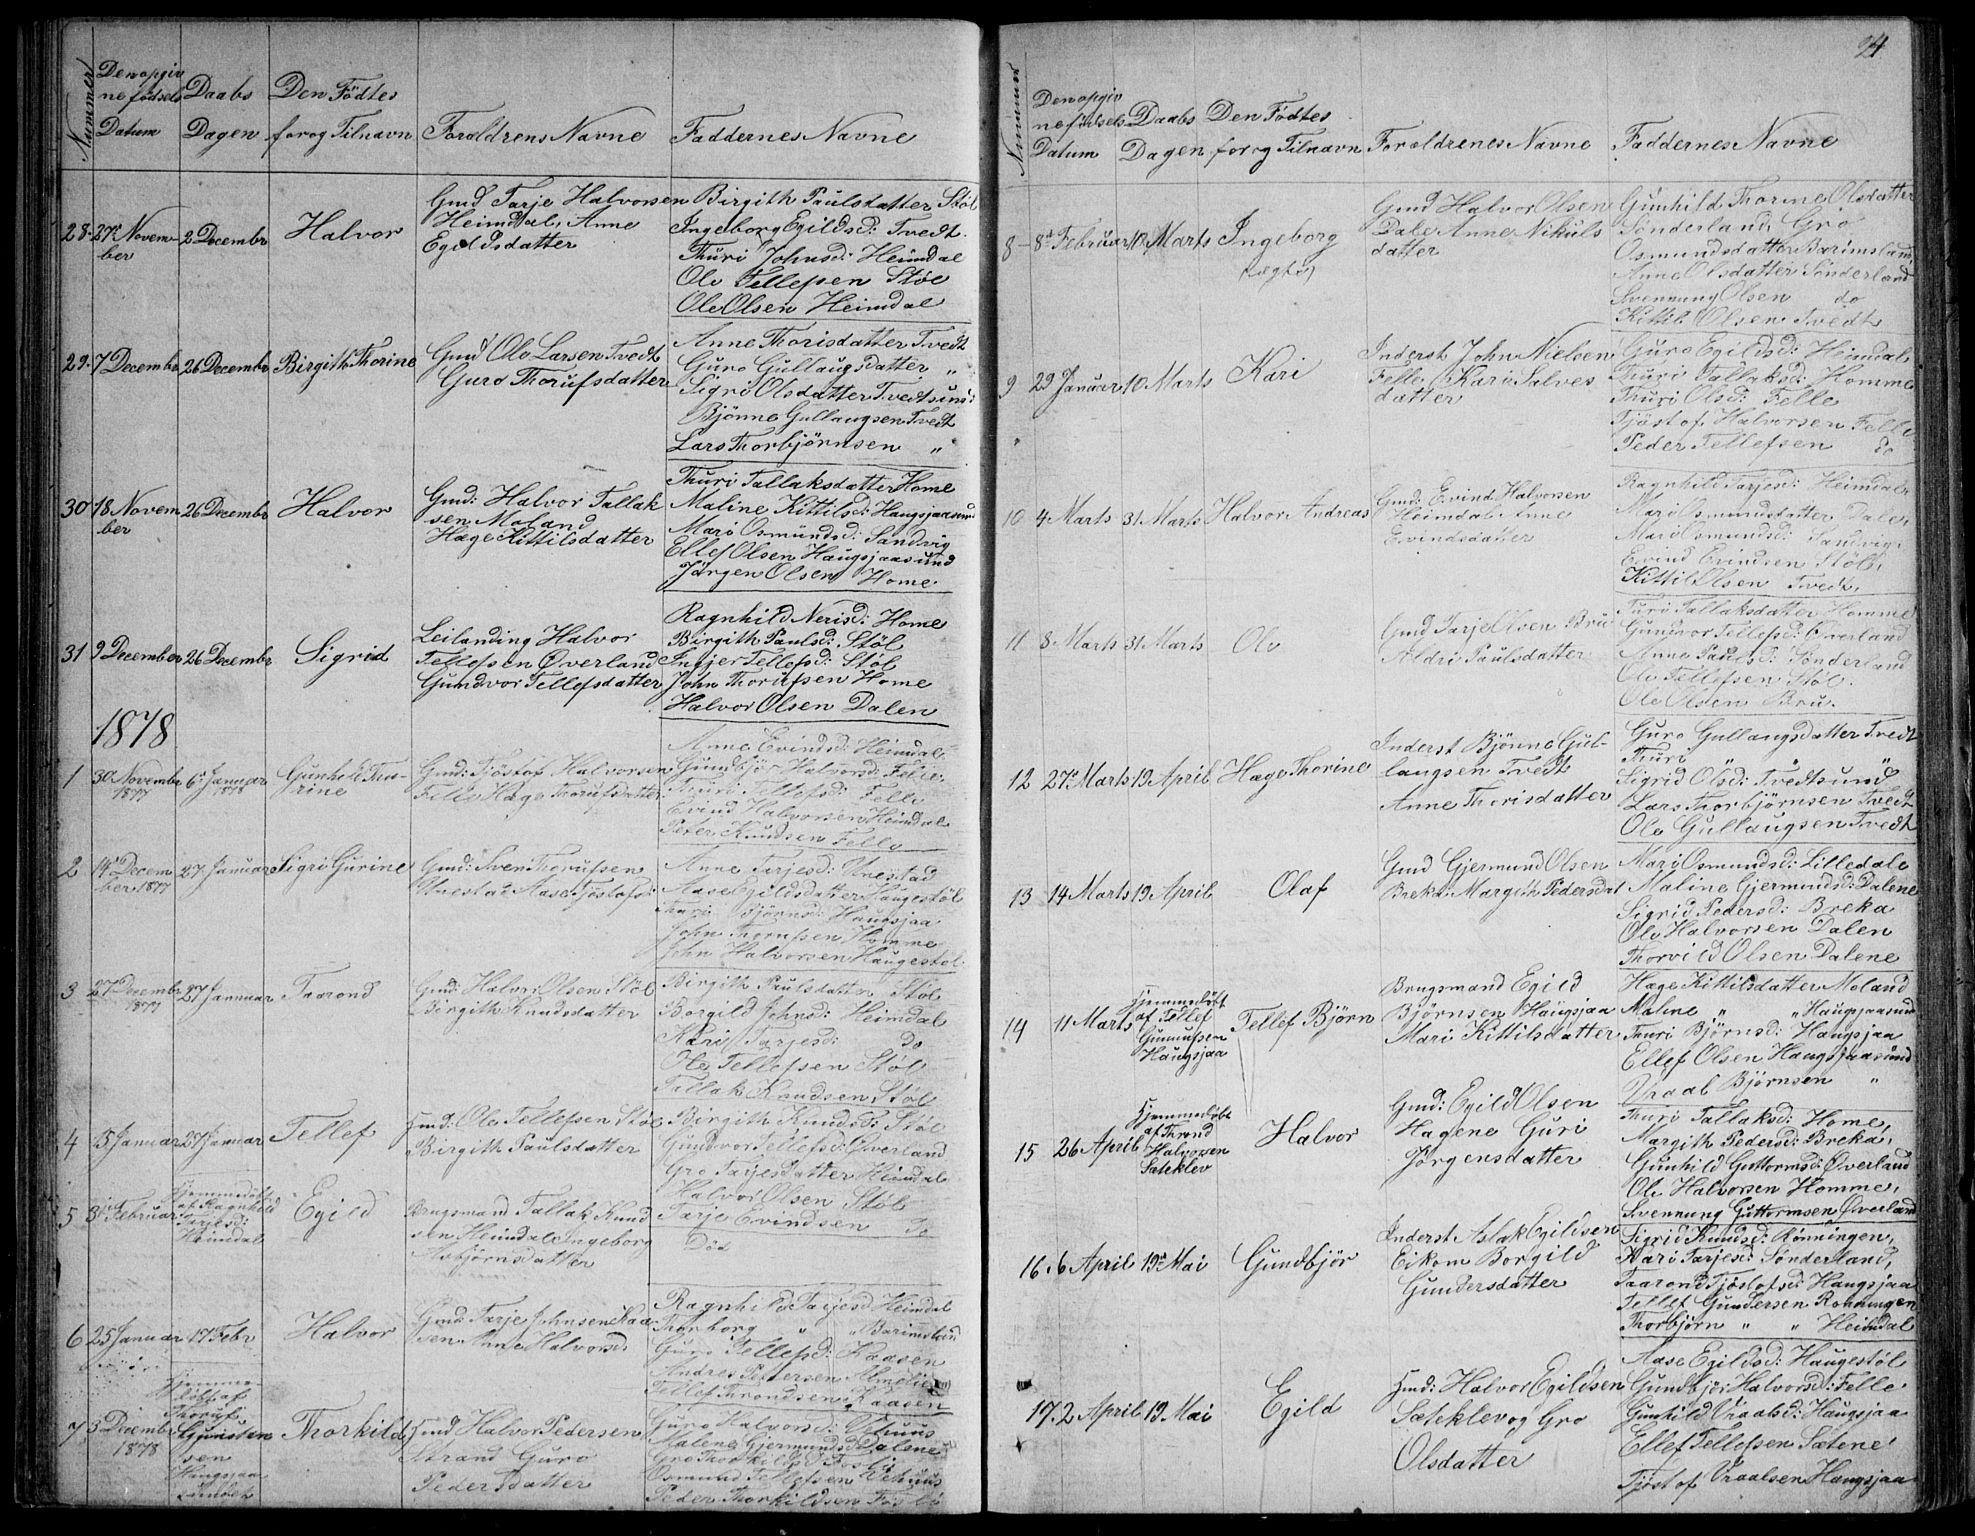 SAKO, Nissedal kirkebøker, G/Gb/L0002: Klokkerbok nr. II 2, 1863-1892, s. 24